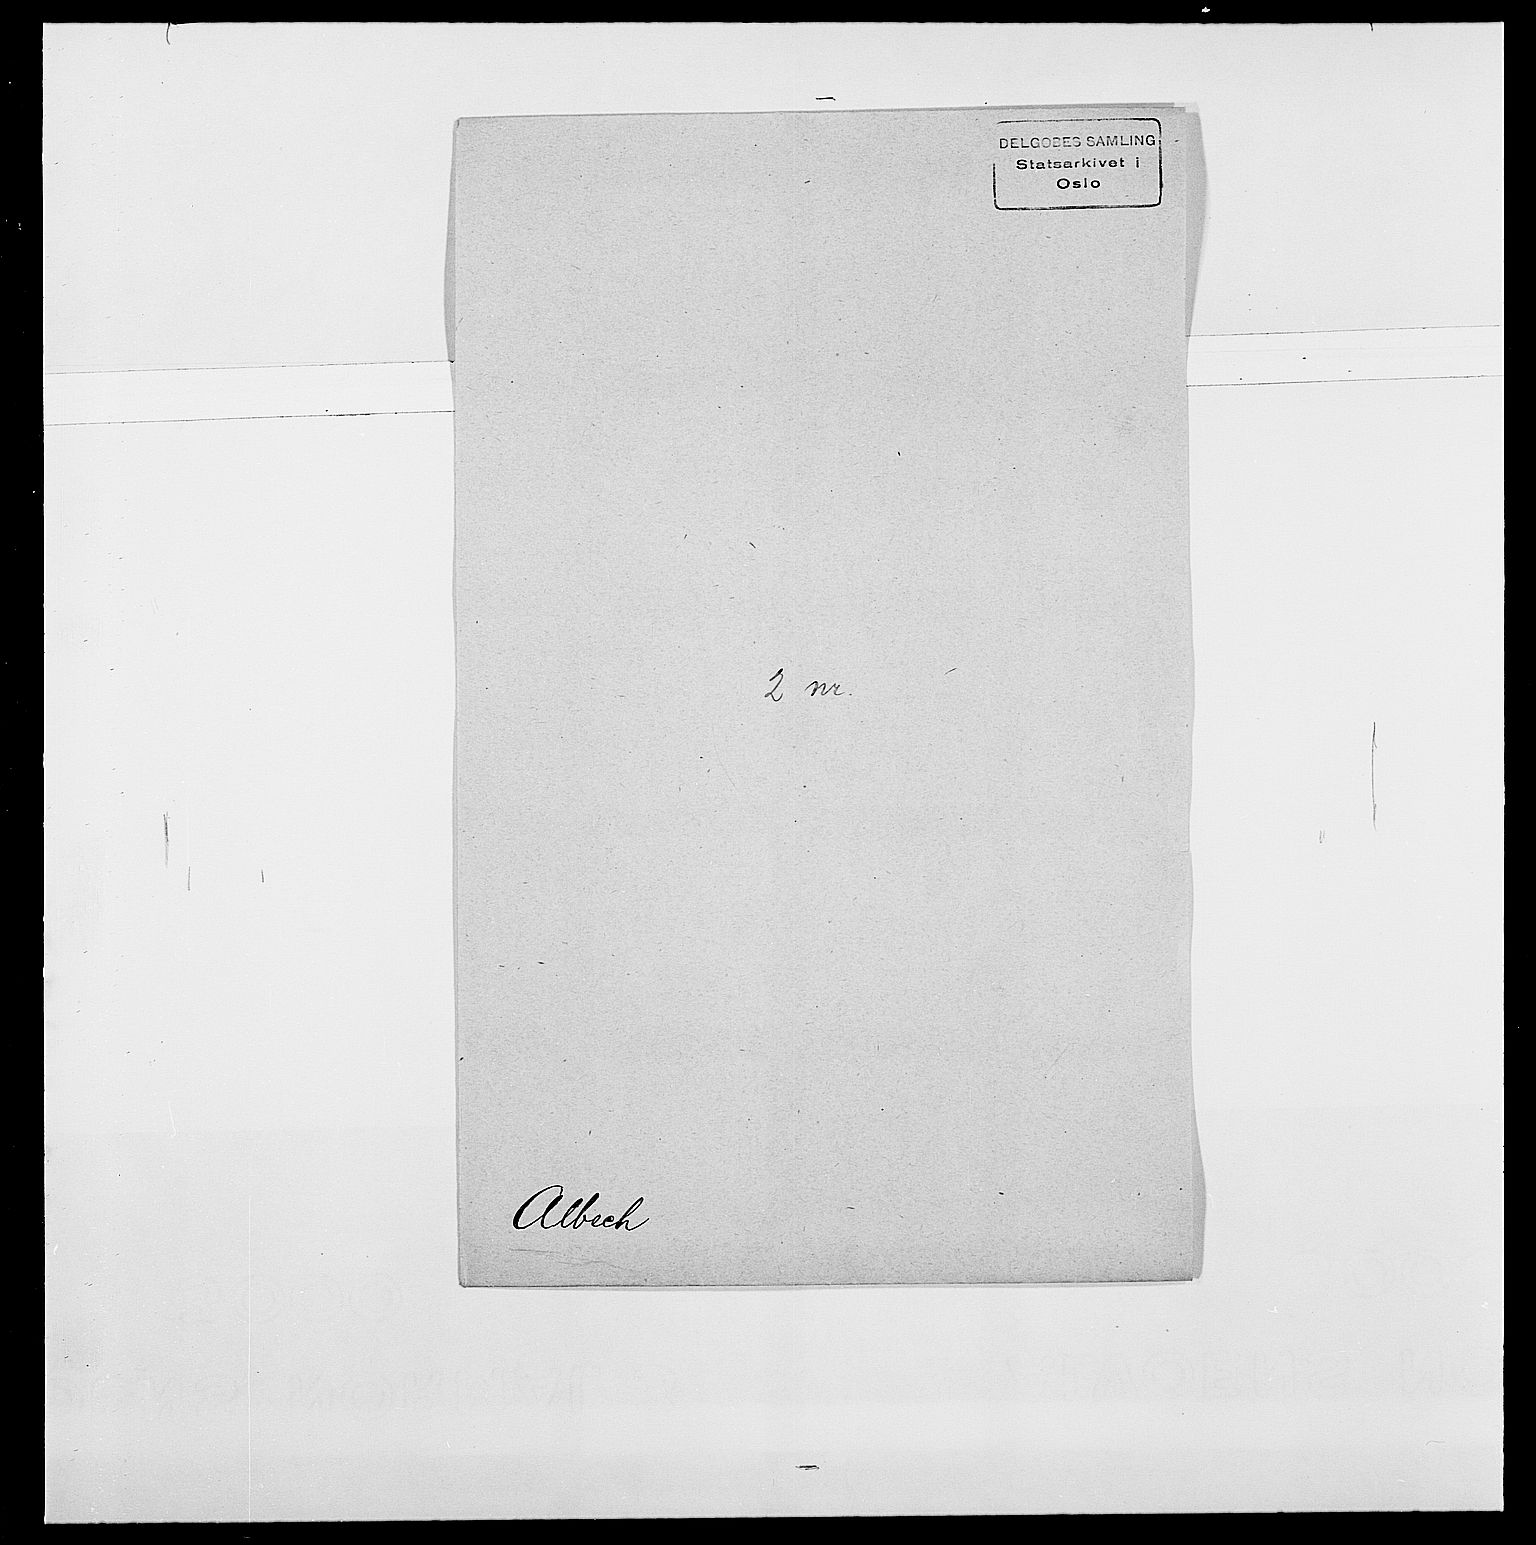 SAO, Delgobe, Charles Antoine - samling, D/Da/L0001: Aabye - Angerman, s. 358